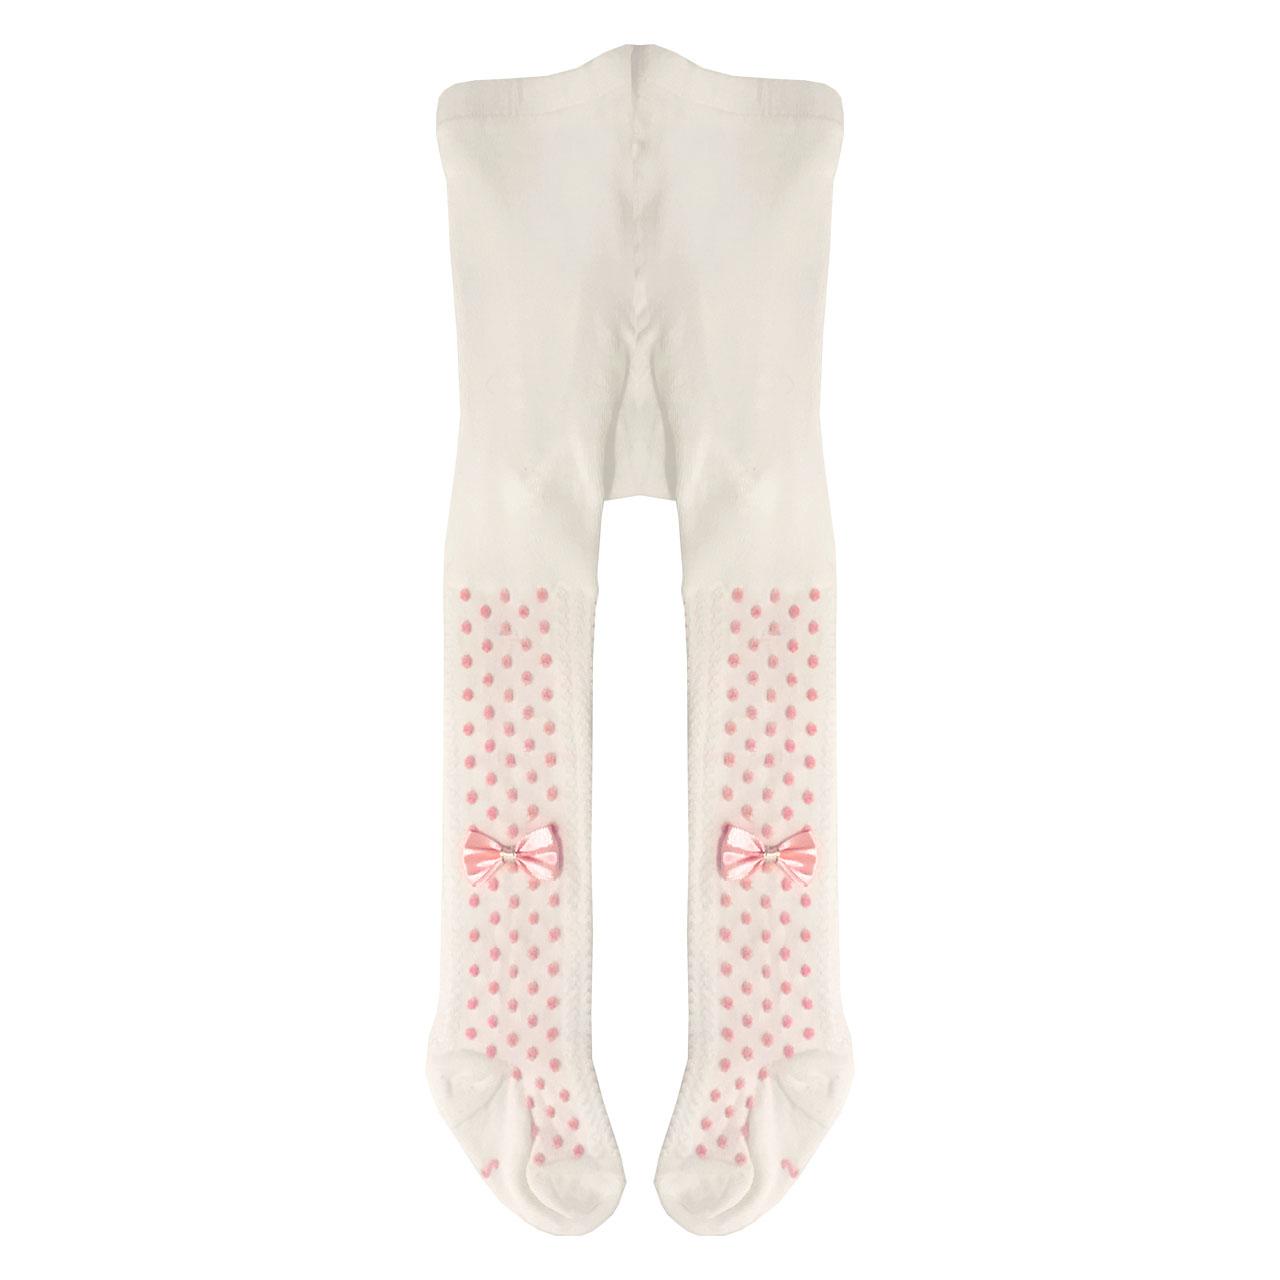 جوراب شلواری دخترانه مدل پاپیون کد 00502